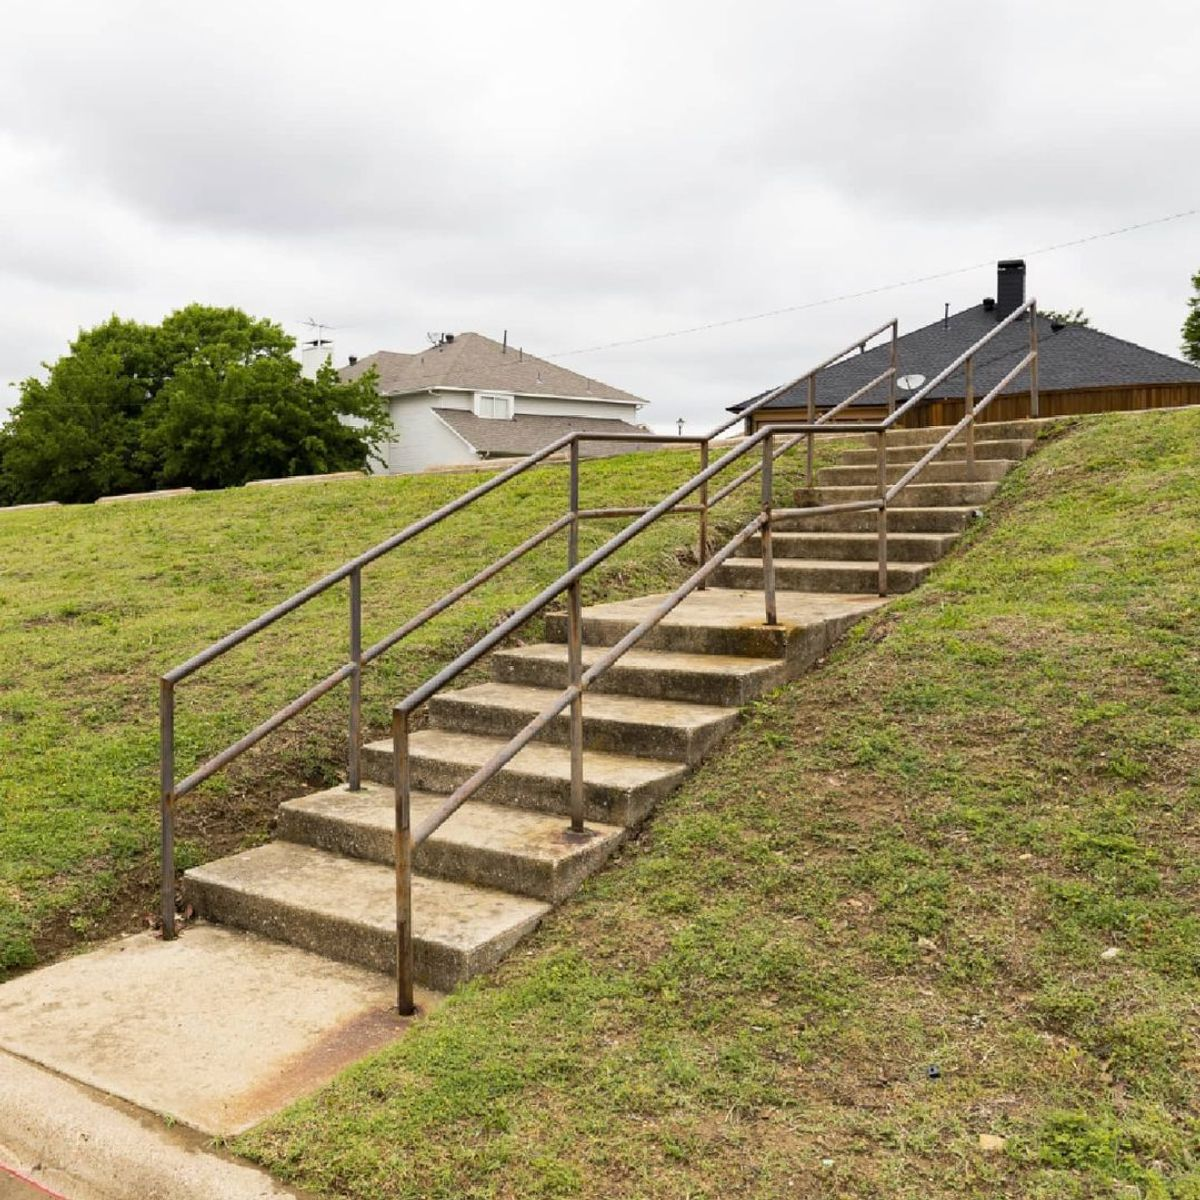 Image for skate spot Carrollton Church - Double Set Rail